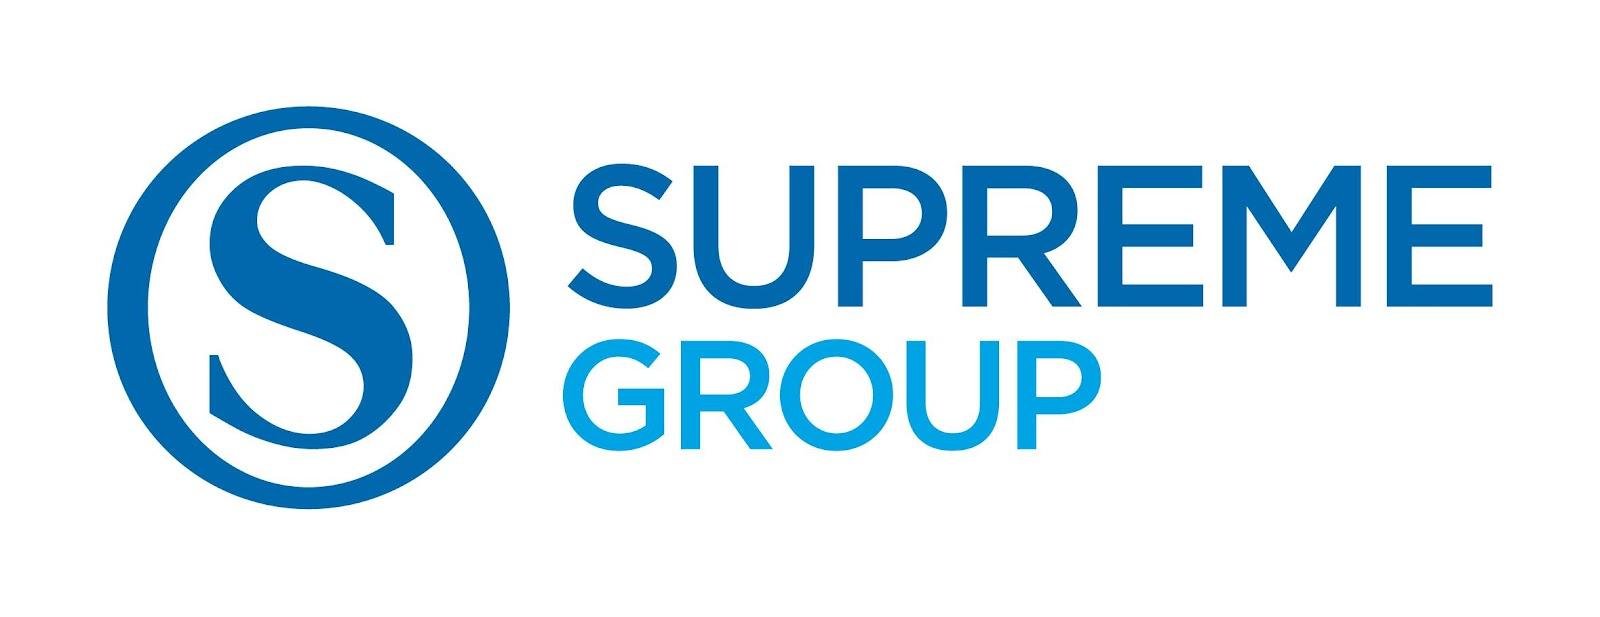 C:\Users\ayan_d\AppData\Local\Microsoft\Windows\Temporary Internet Files\Content.Word\supreme group logo.jpg